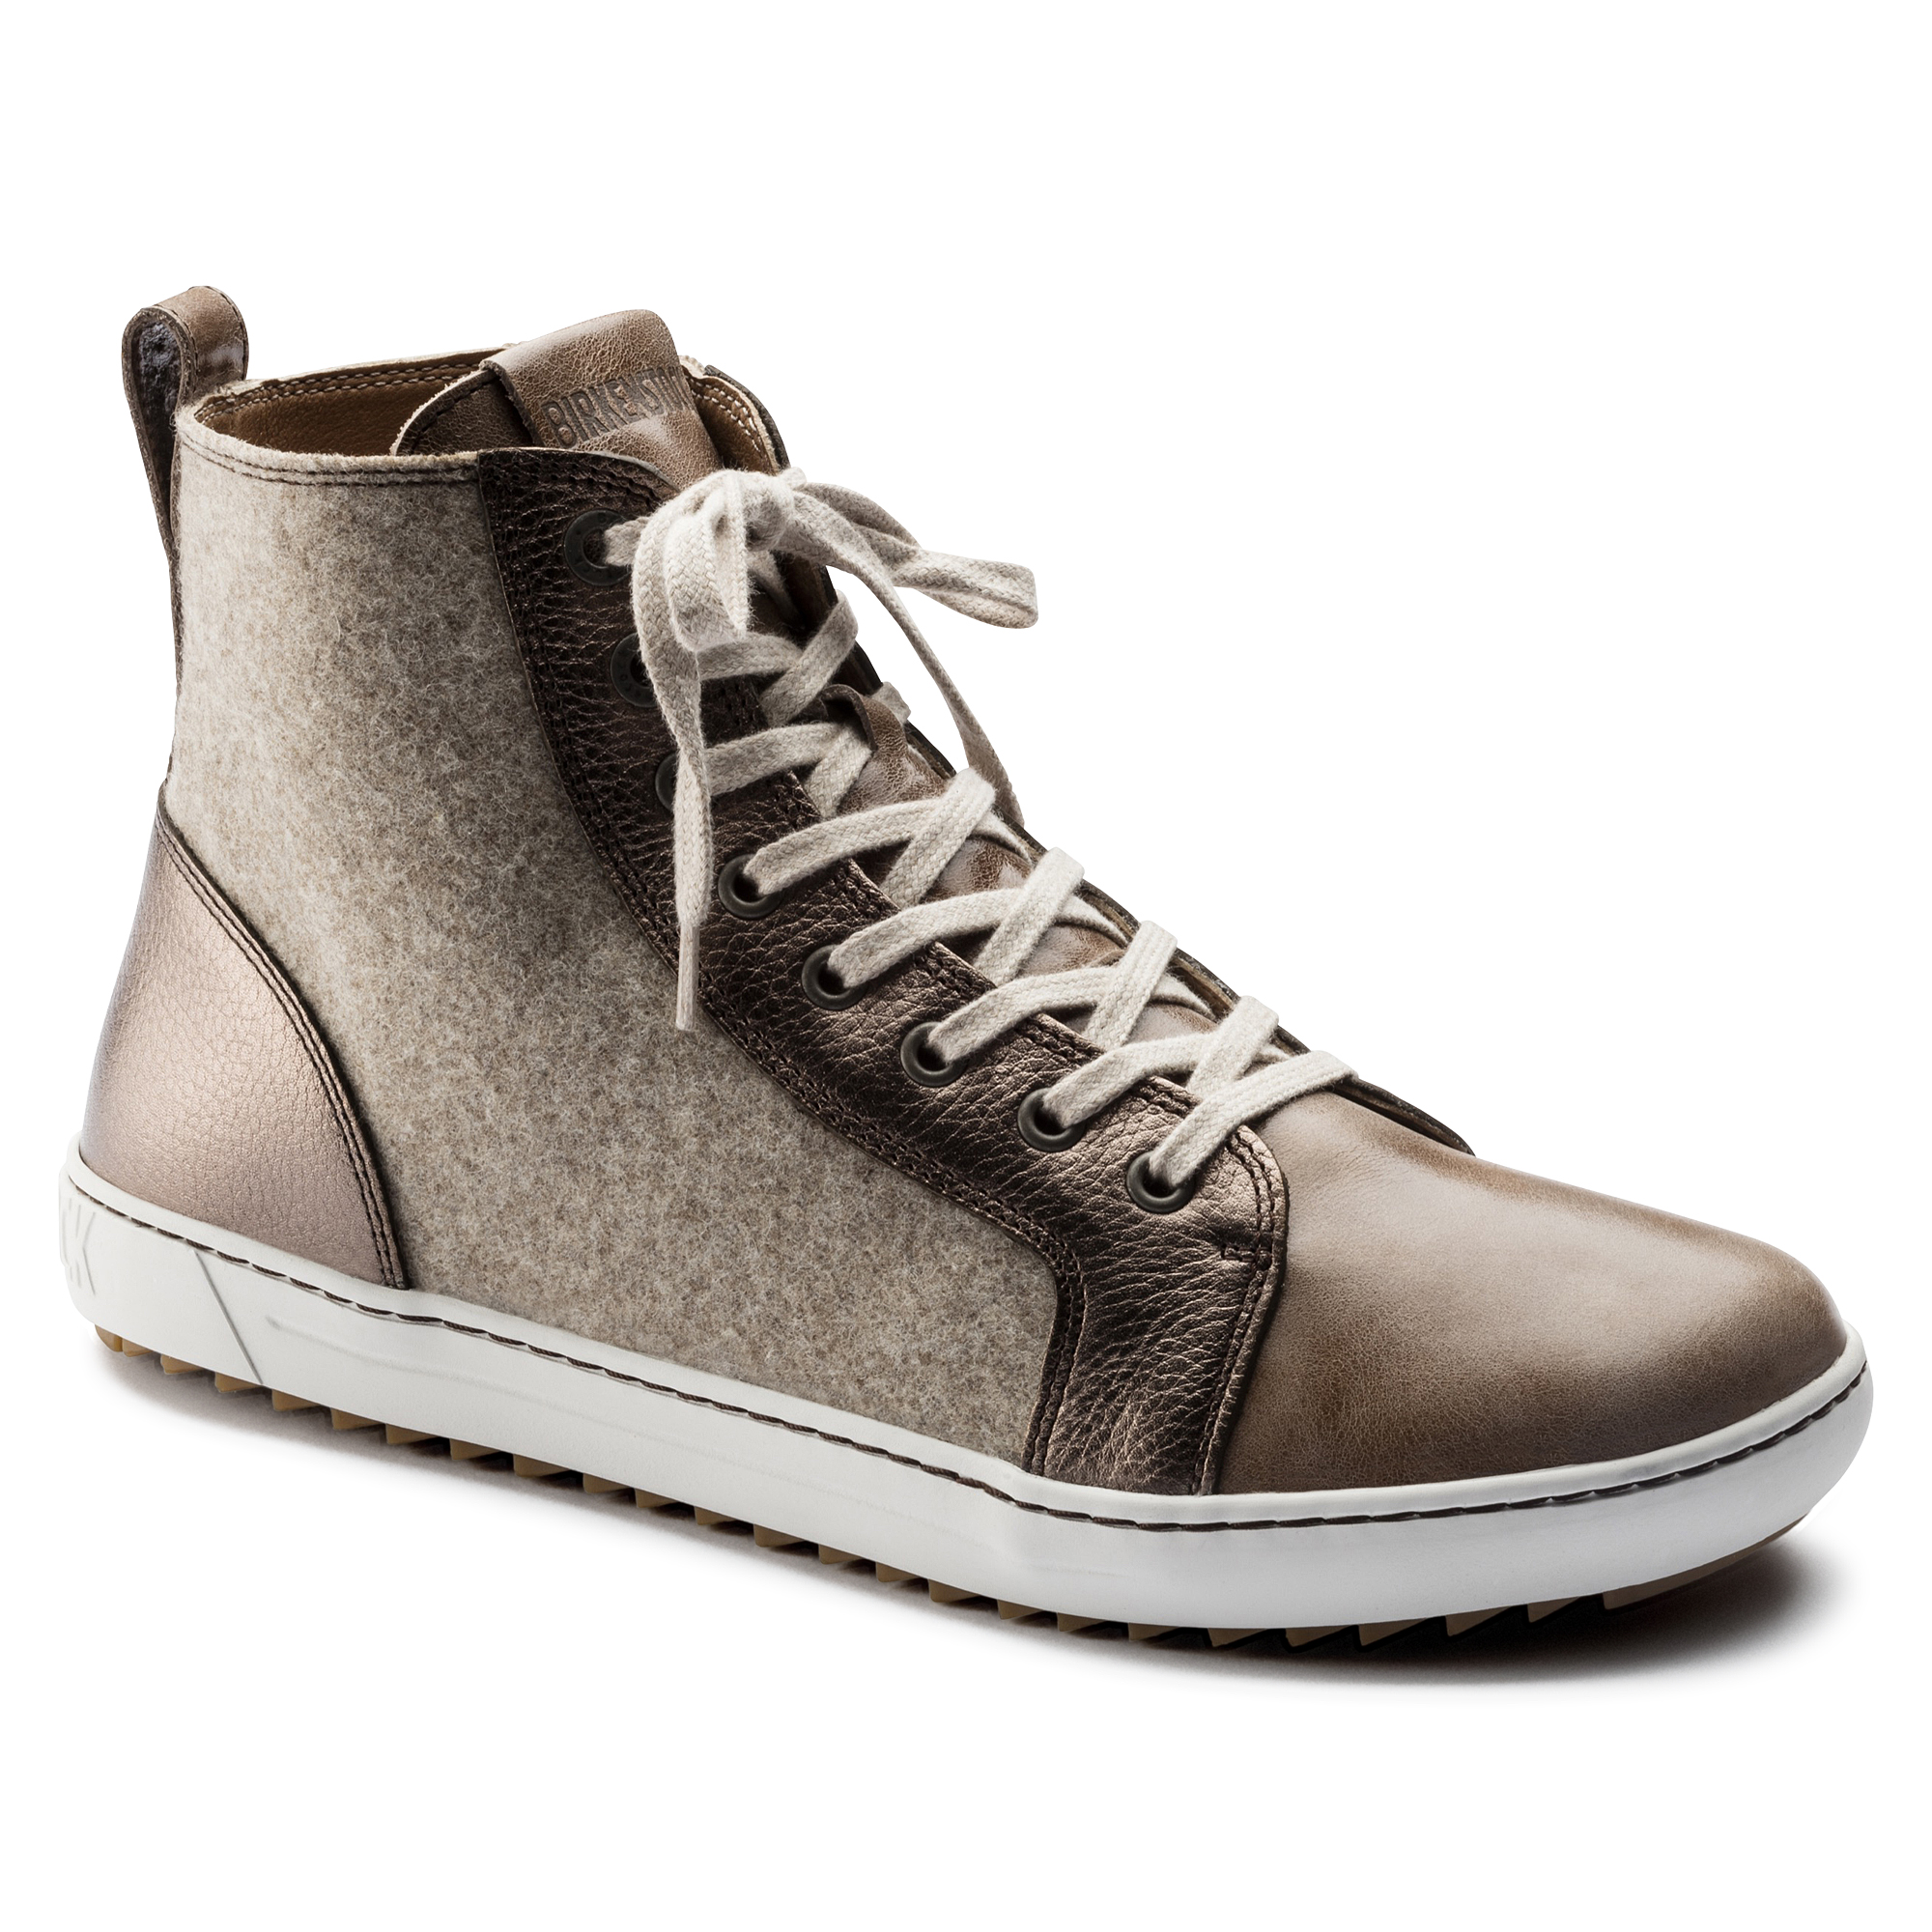 684e1e478e3b Bartlett Natural Leather Birko-Felt Brown